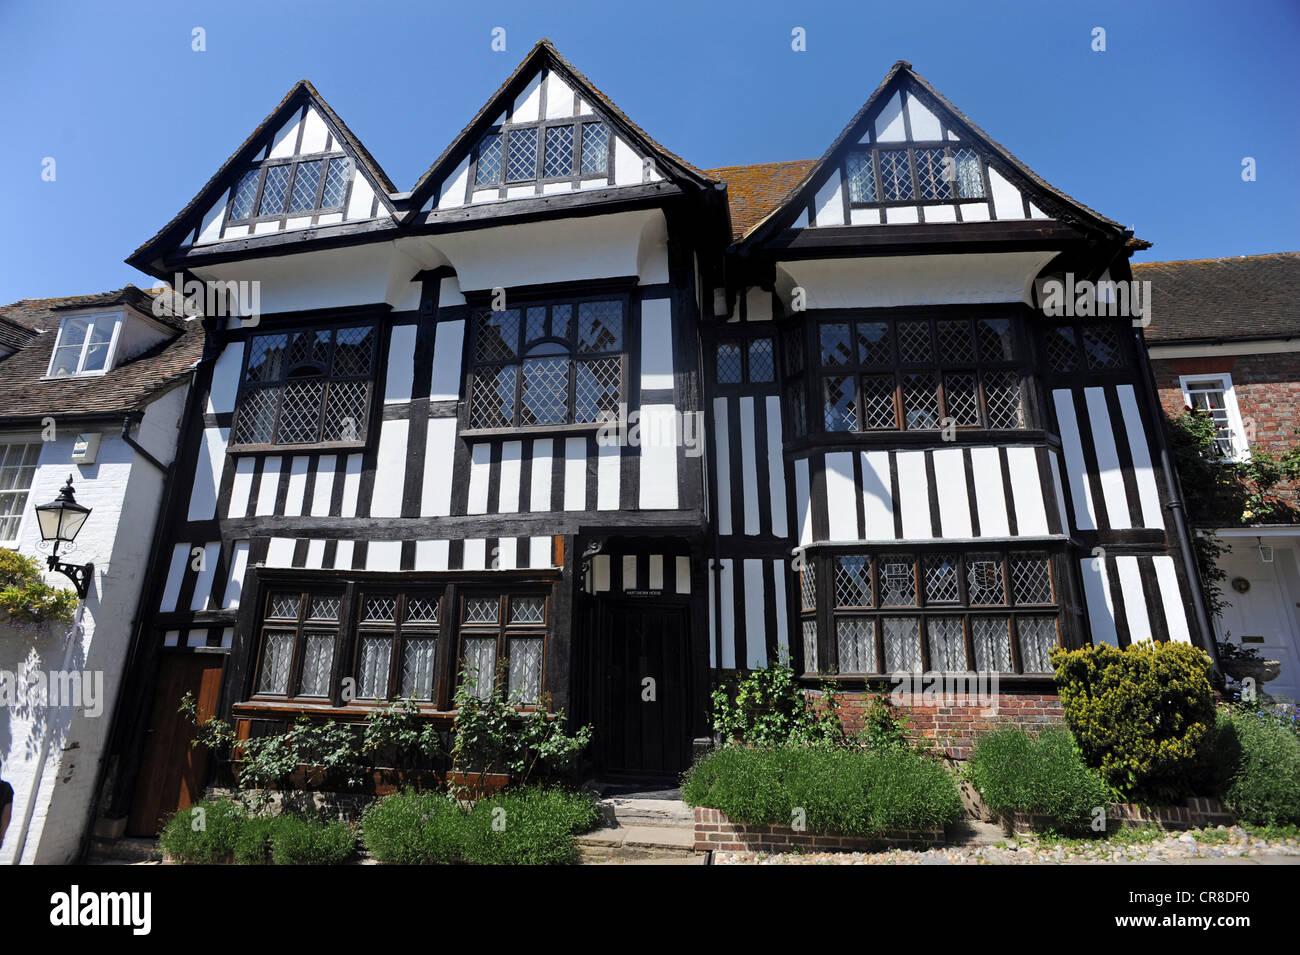 An Old Tudor Style House In Mermaid Street Rye